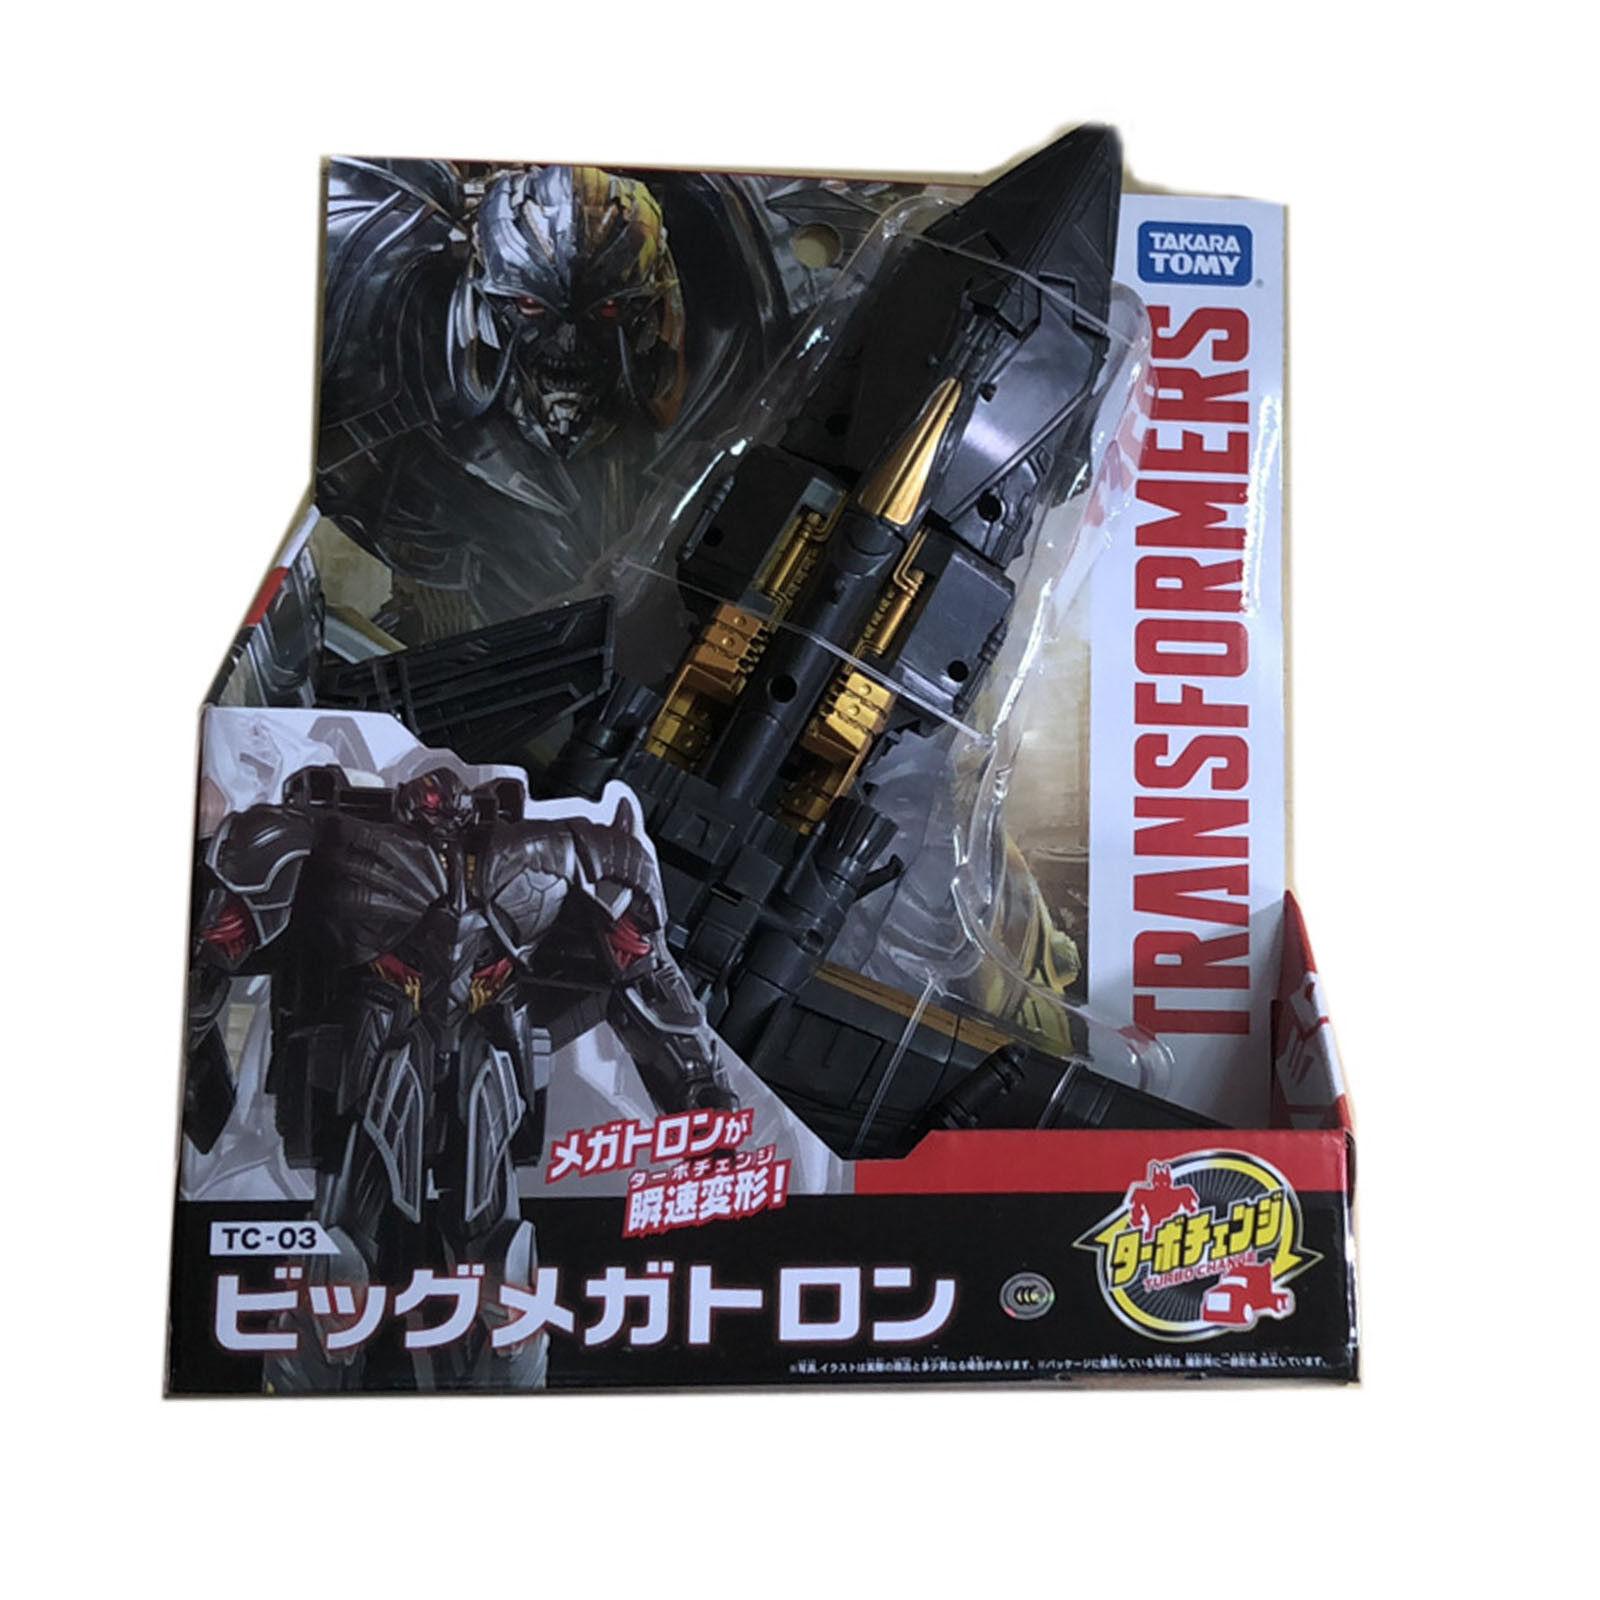 Transformers Turbo Change TC-03 TC 03 MEGATRON Autobots Spielfigur